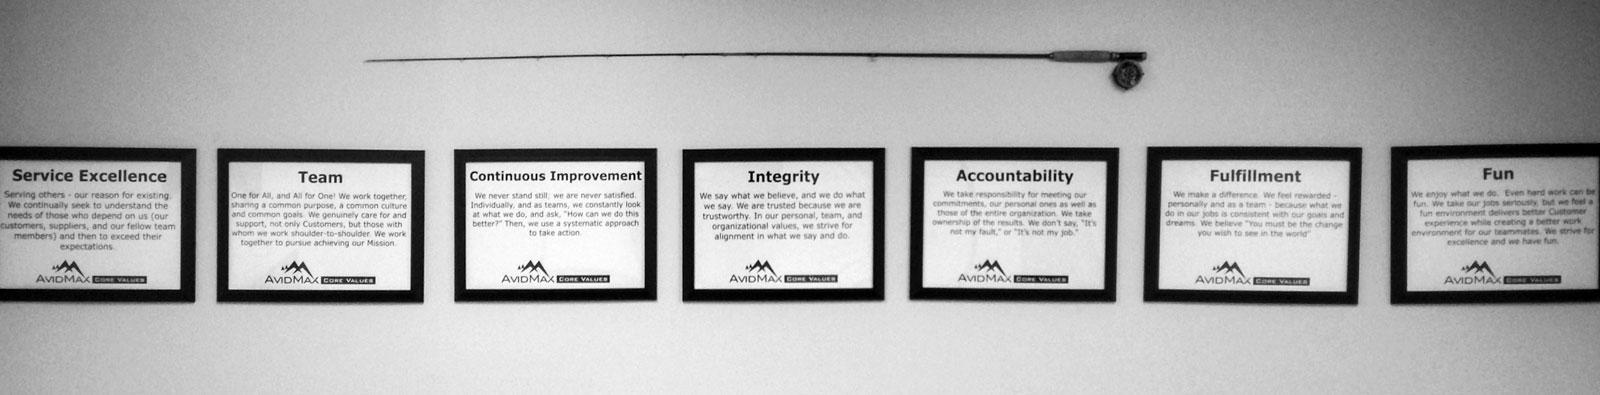 AvidMax core values